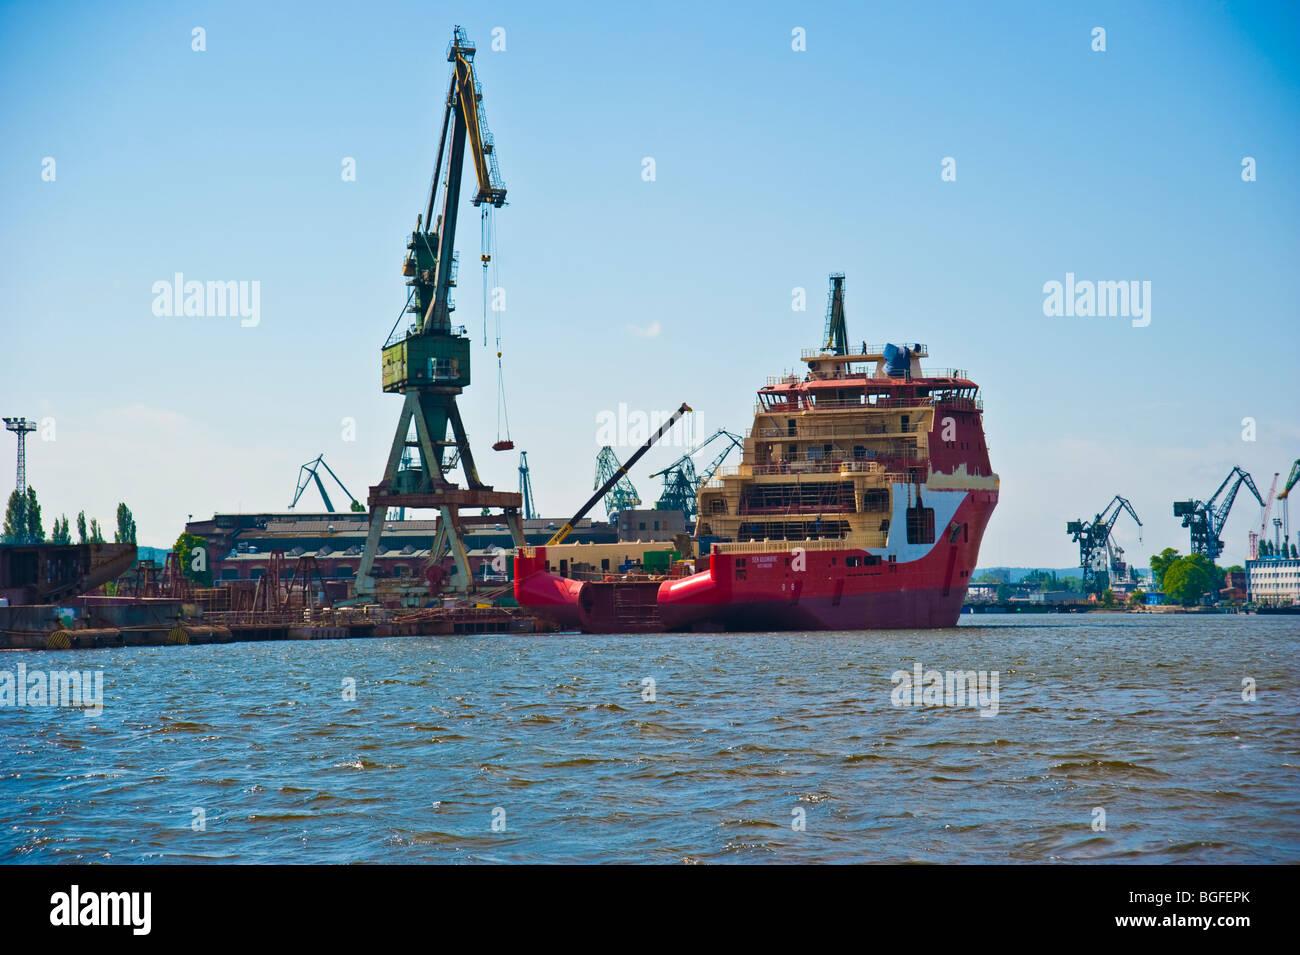 Shipyard with cranes and docks, Gdansk, Poland   Werft Danzig, Polen - Stock Image